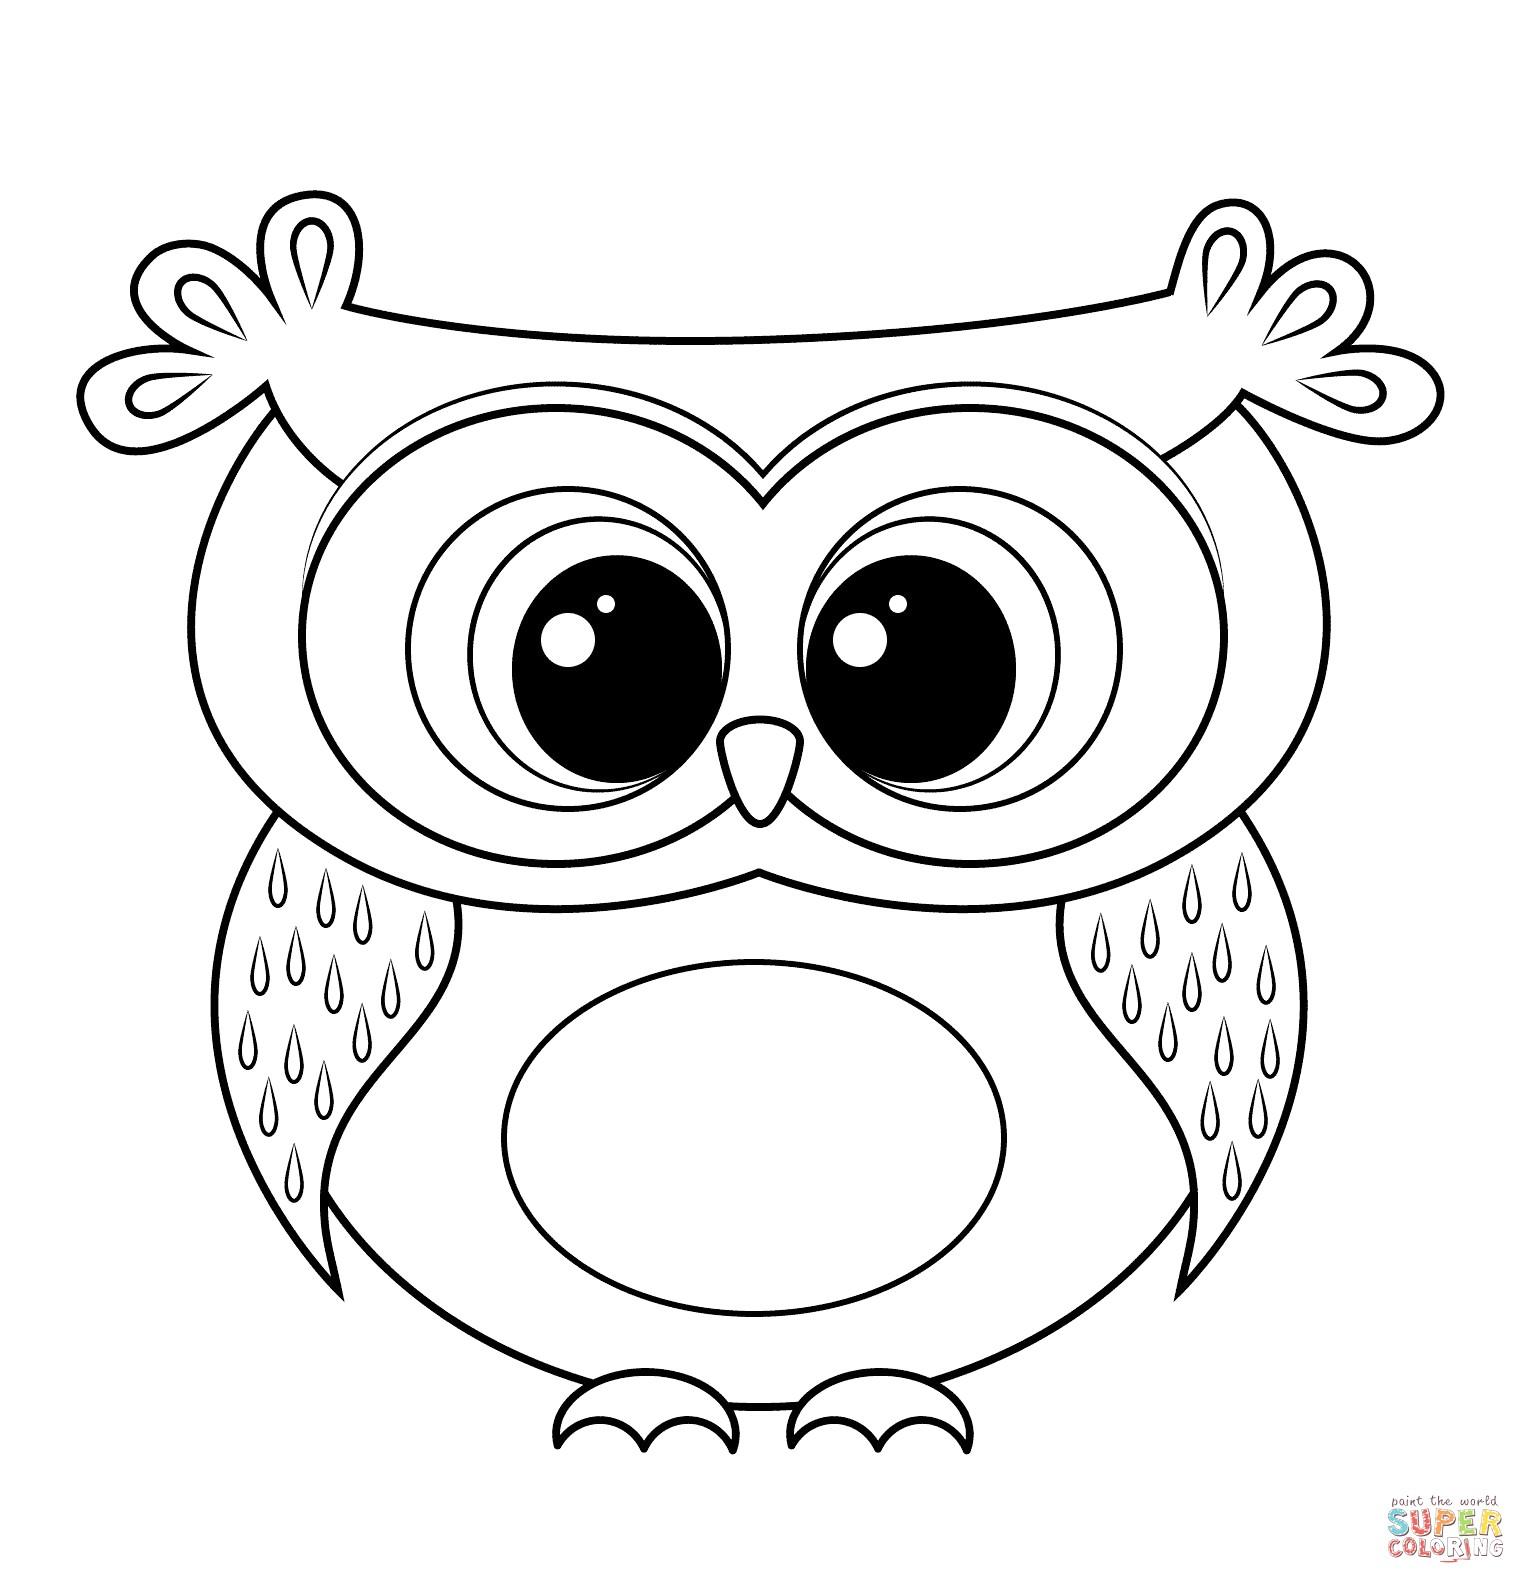 Cartoon clipart coloring clip art freeuse Coloring Ideas : Coloring Ideas Owl Clipart Black And White Cartoon ... clip art freeuse